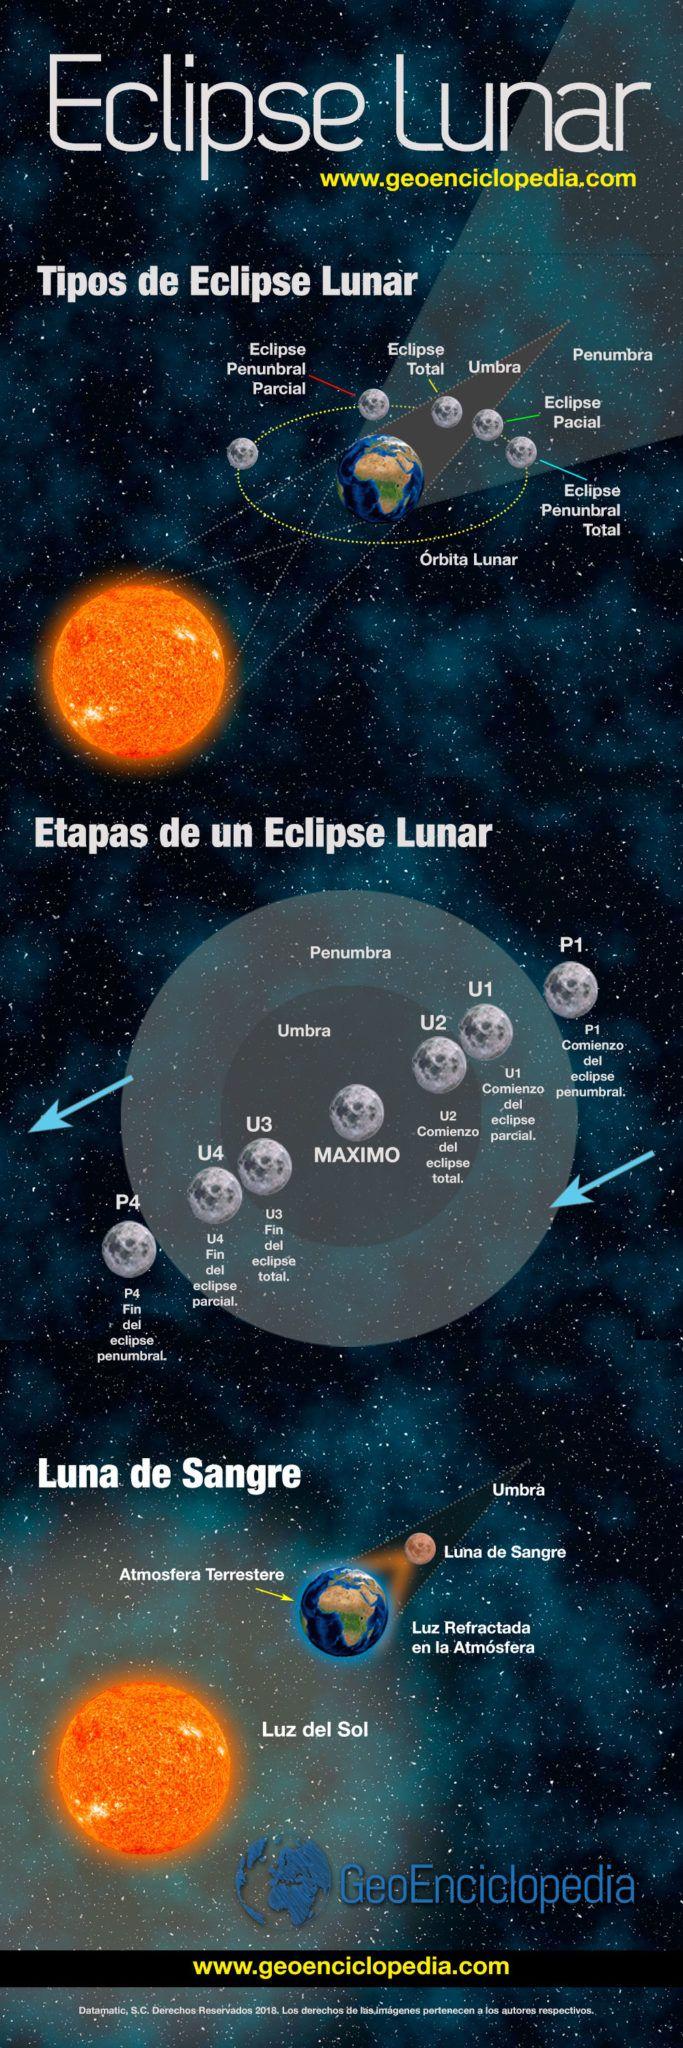 #Infografía #Eclipse Lunar